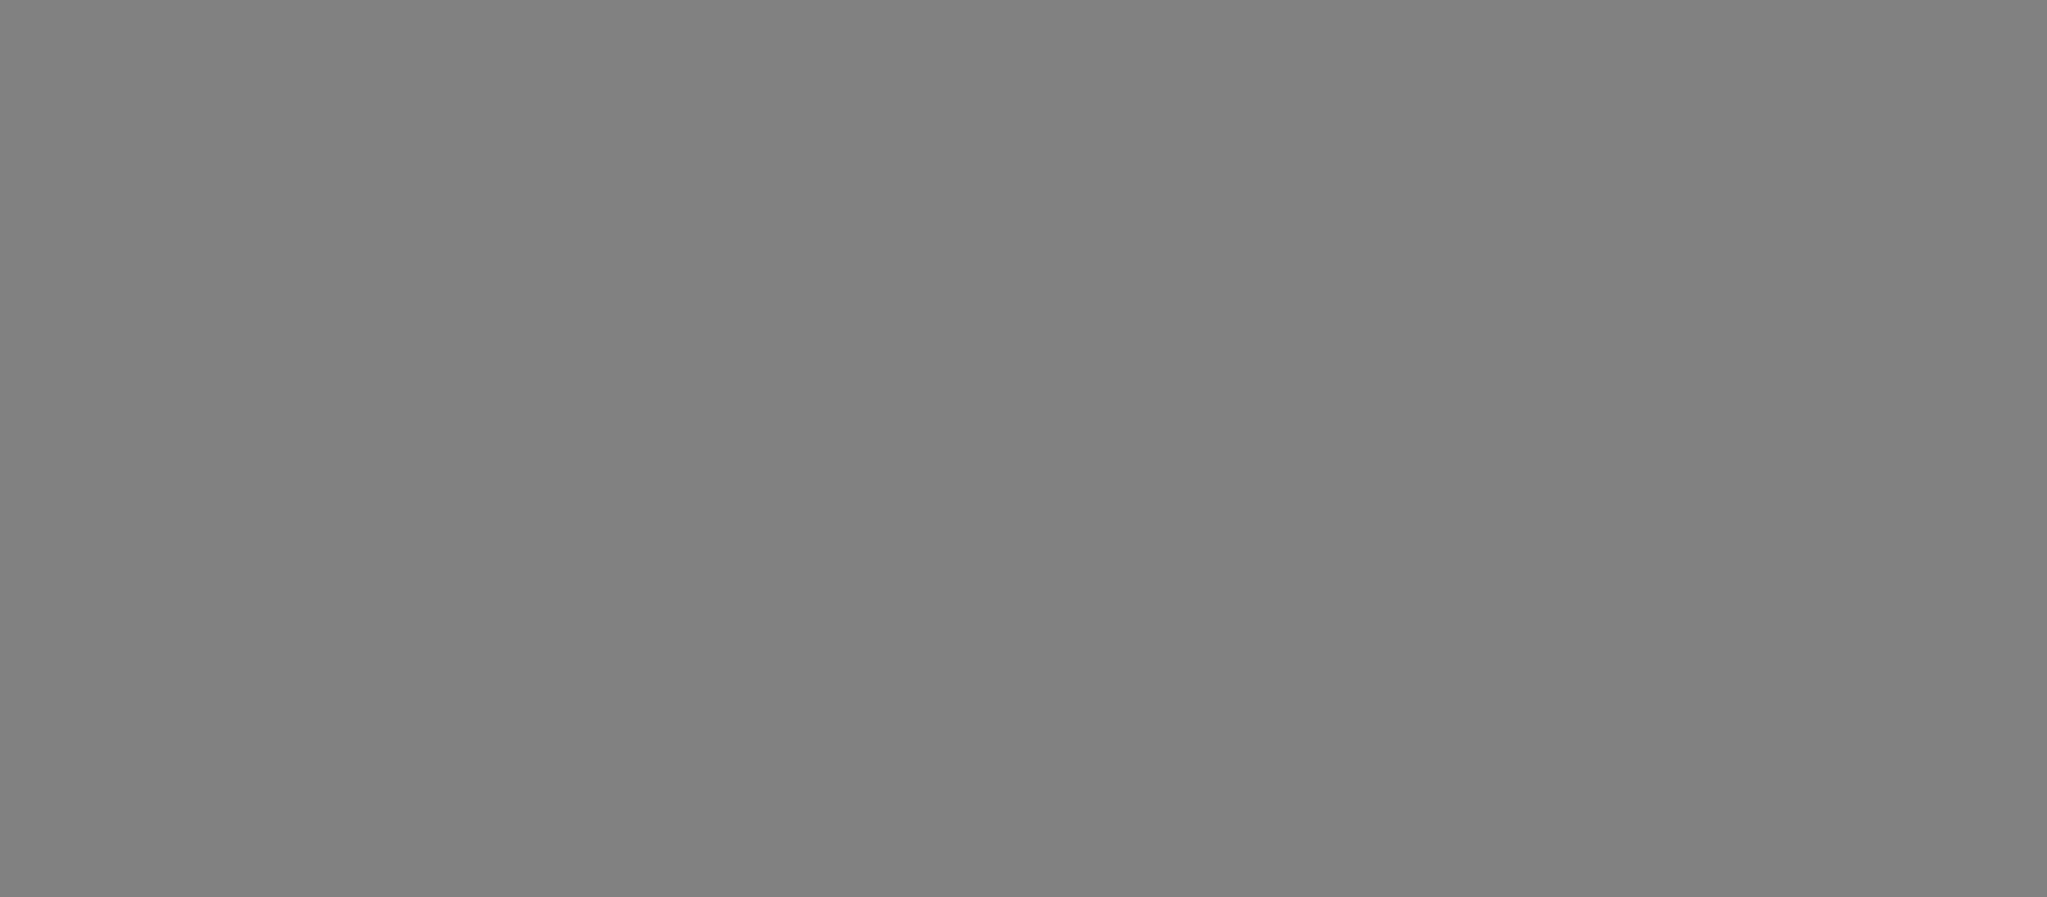 transparent_black_box.png